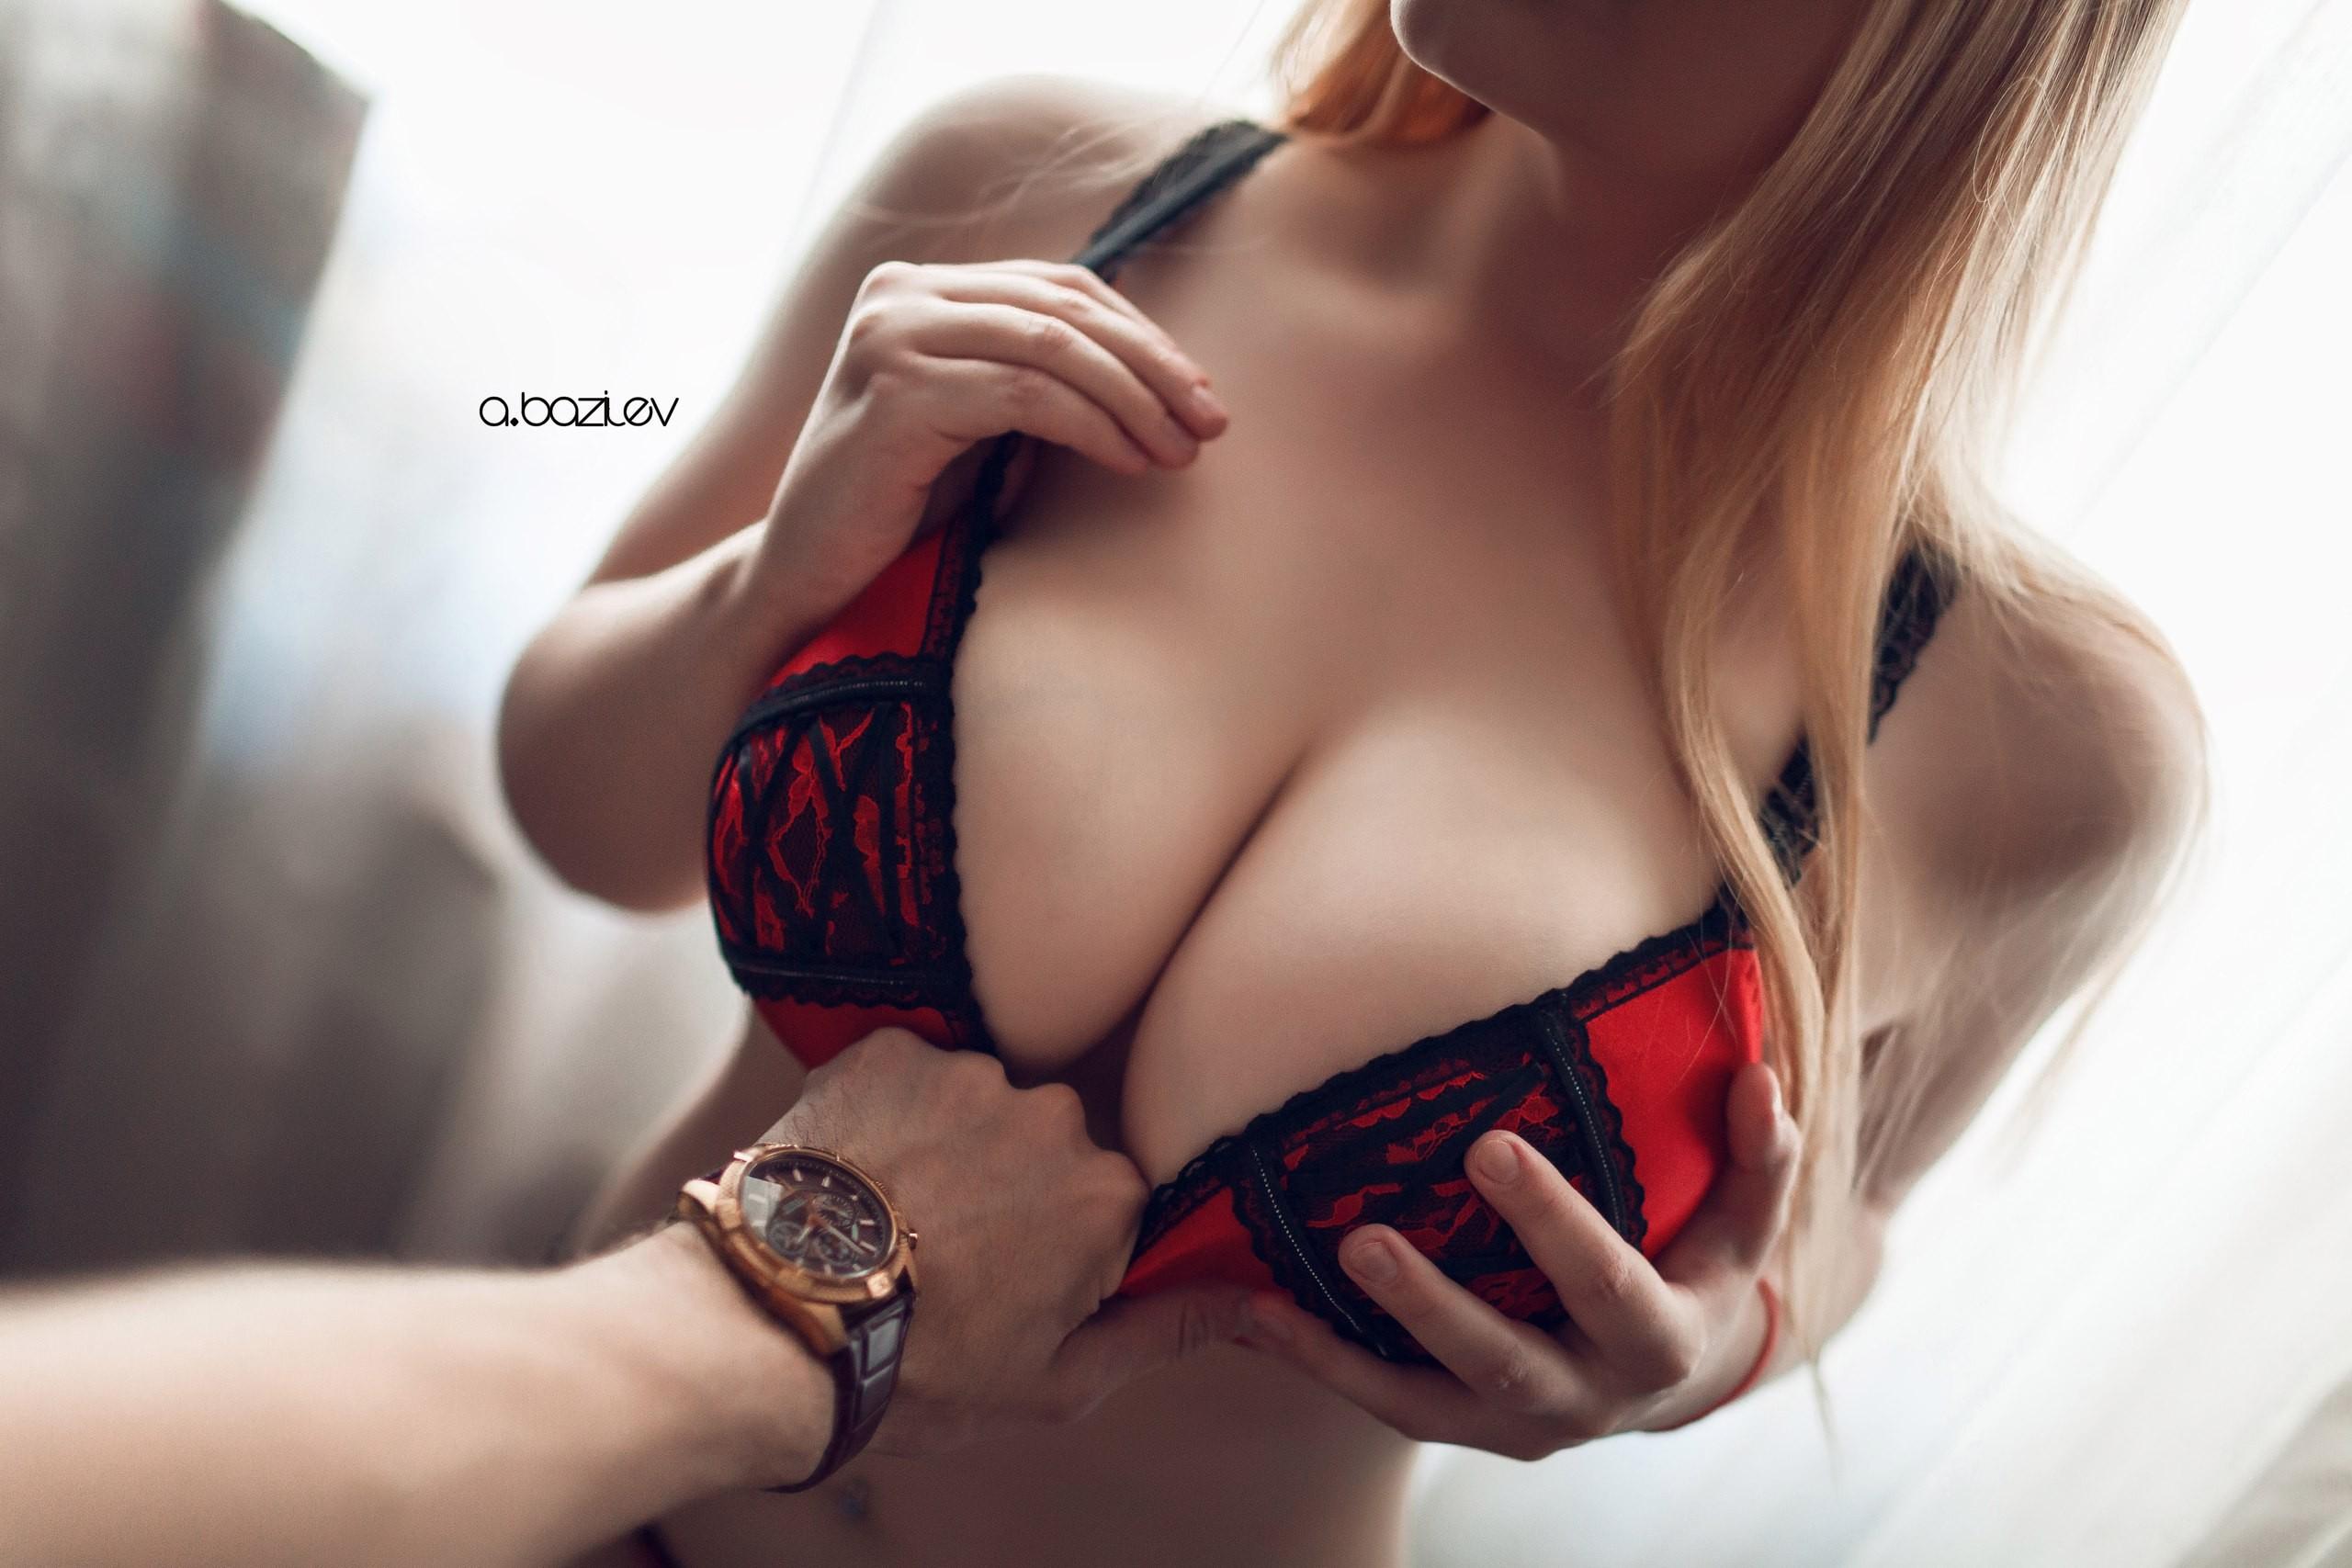 Big Boobs Cleavage Pics